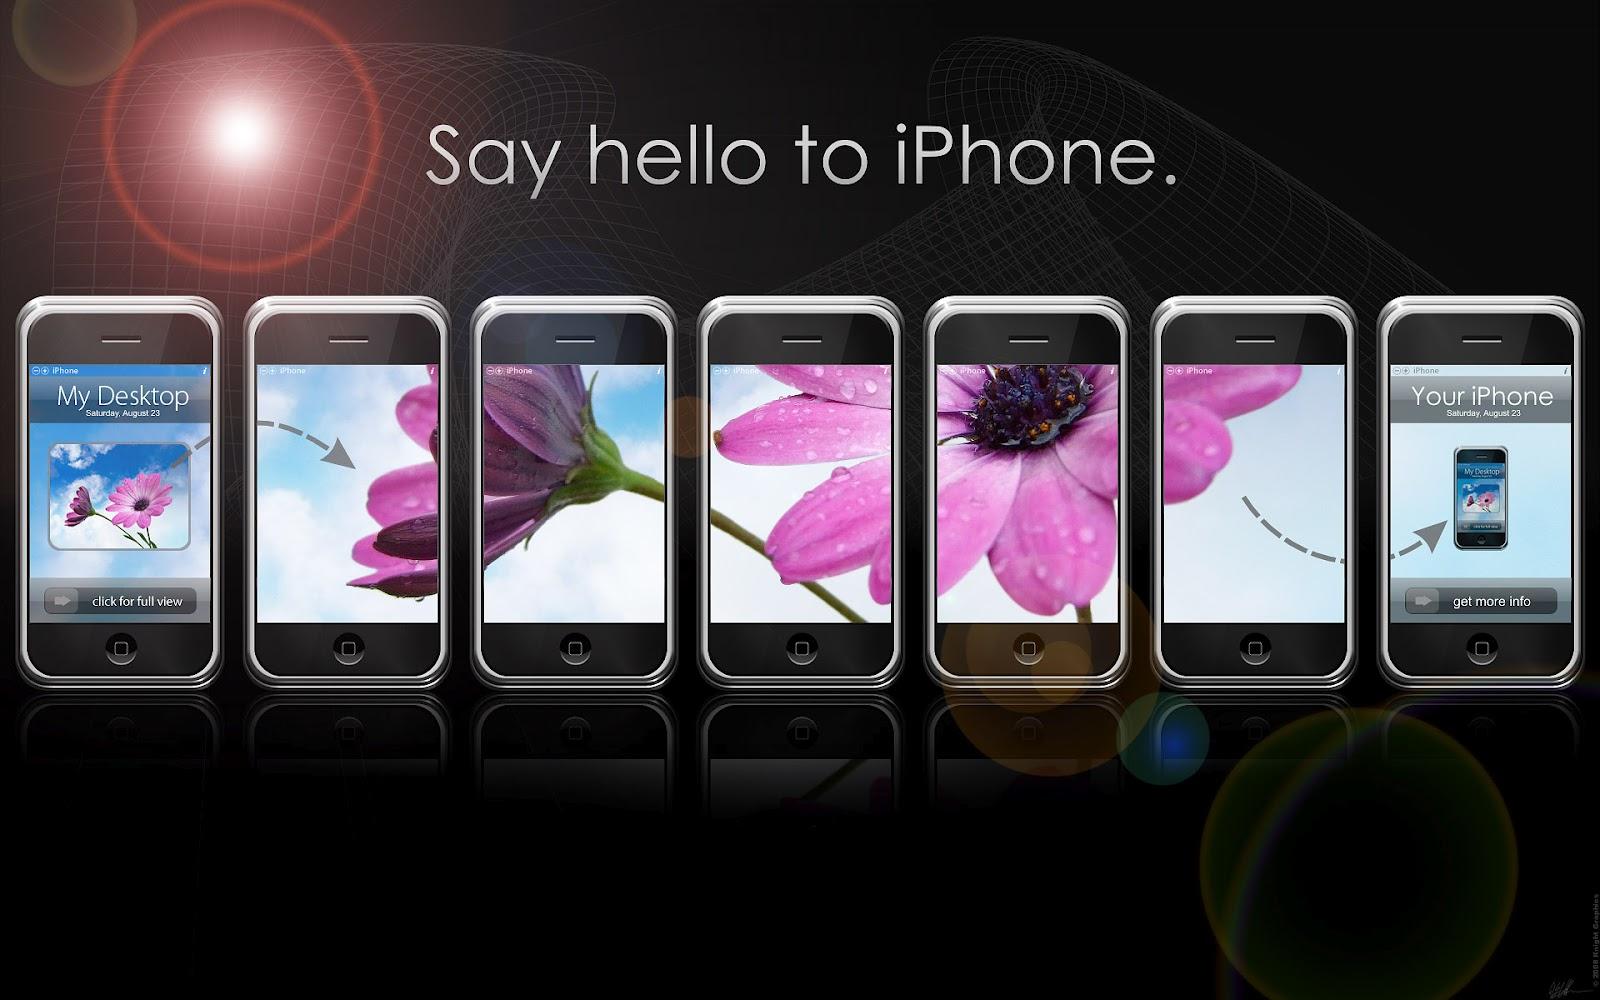 http://4.bp.blogspot.com/-1_C2x--5PkY/UGQTAK6FafI/AAAAAAAAAN8/YP88K2z0azM/s1600/Best-iphone-HD-dekstop-wallpapers-photo-picture-for-pc-16.jpg